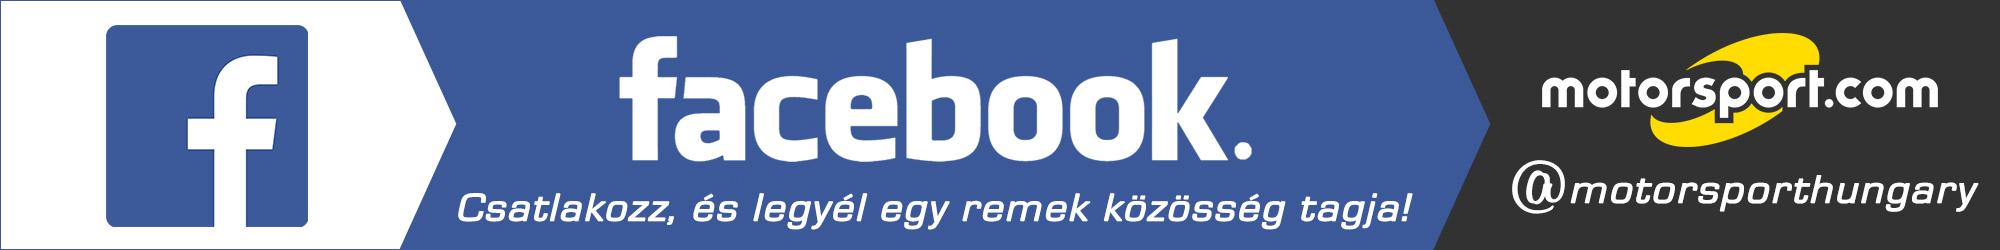 Motorsport Hungary Facebook